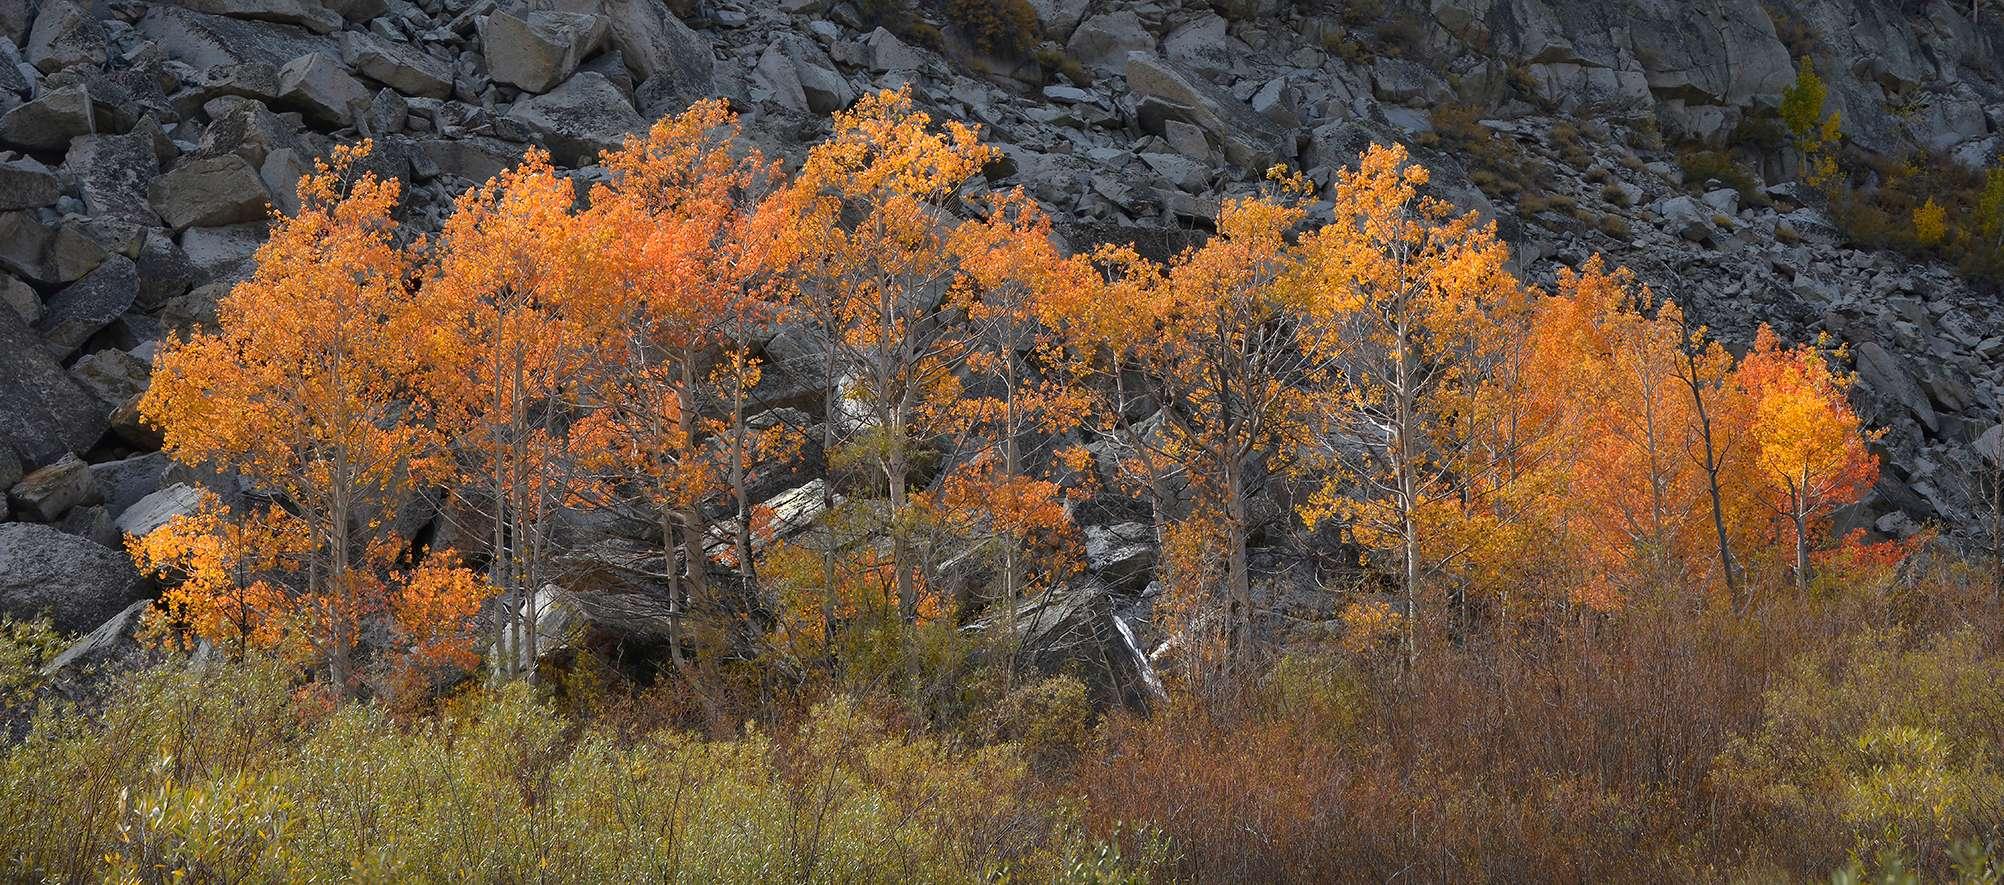 395-Aspen-Color-on-Black-Rock---web-version---Horizontal